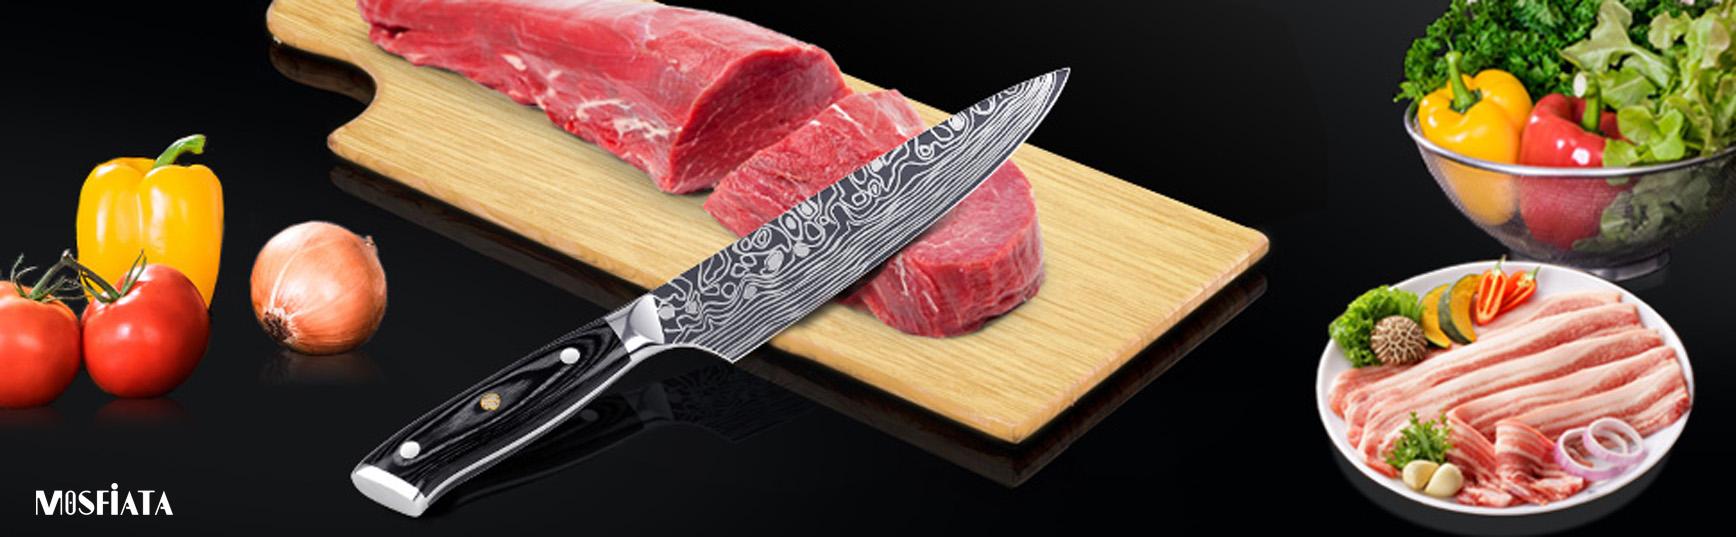 mosfiata knife 09.jpg